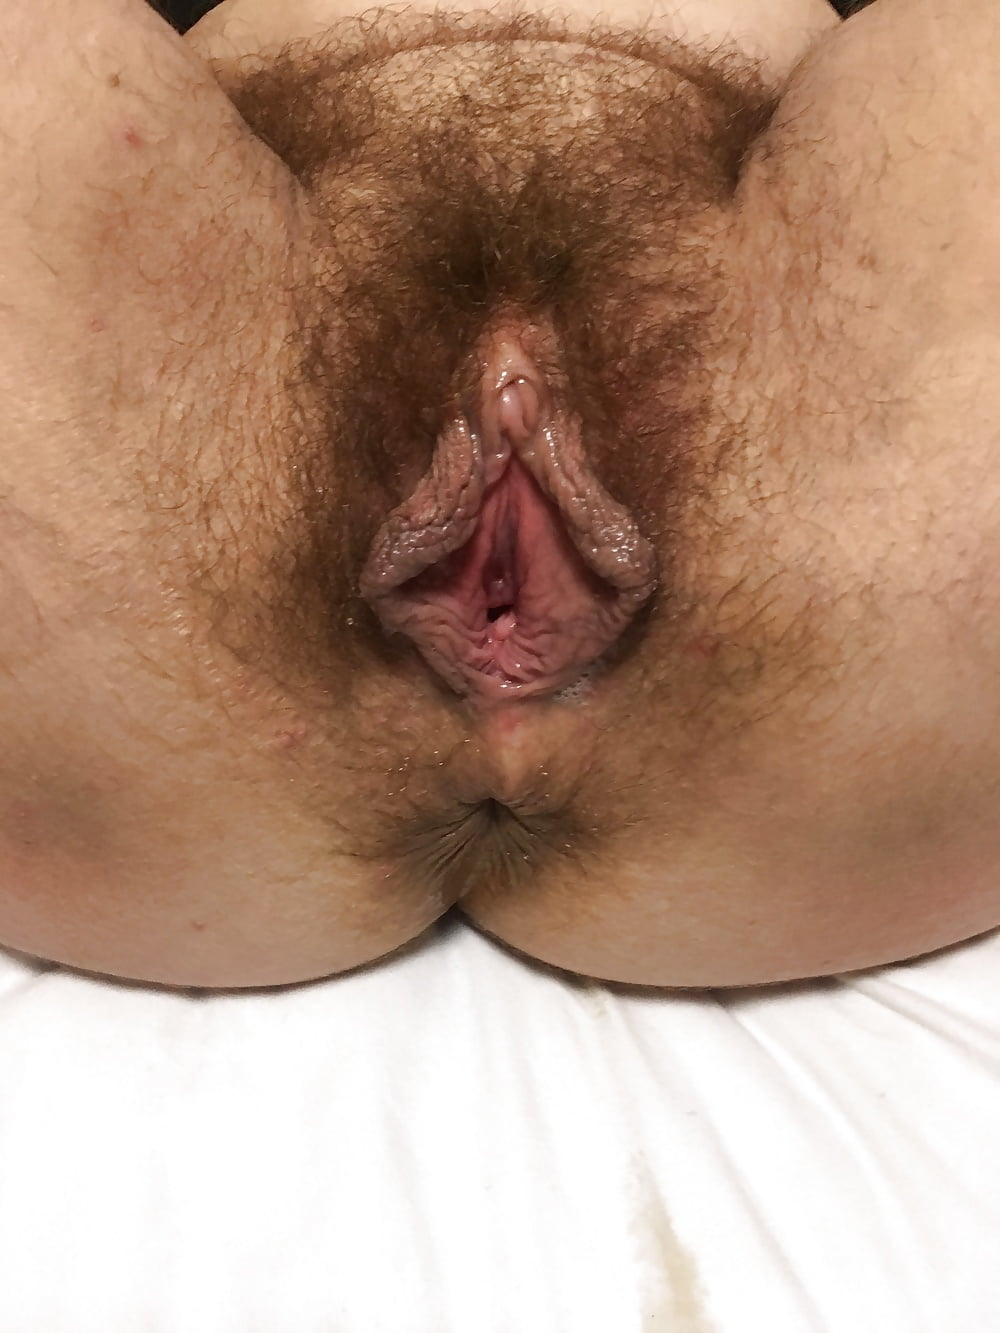 Black hairy pussy lips